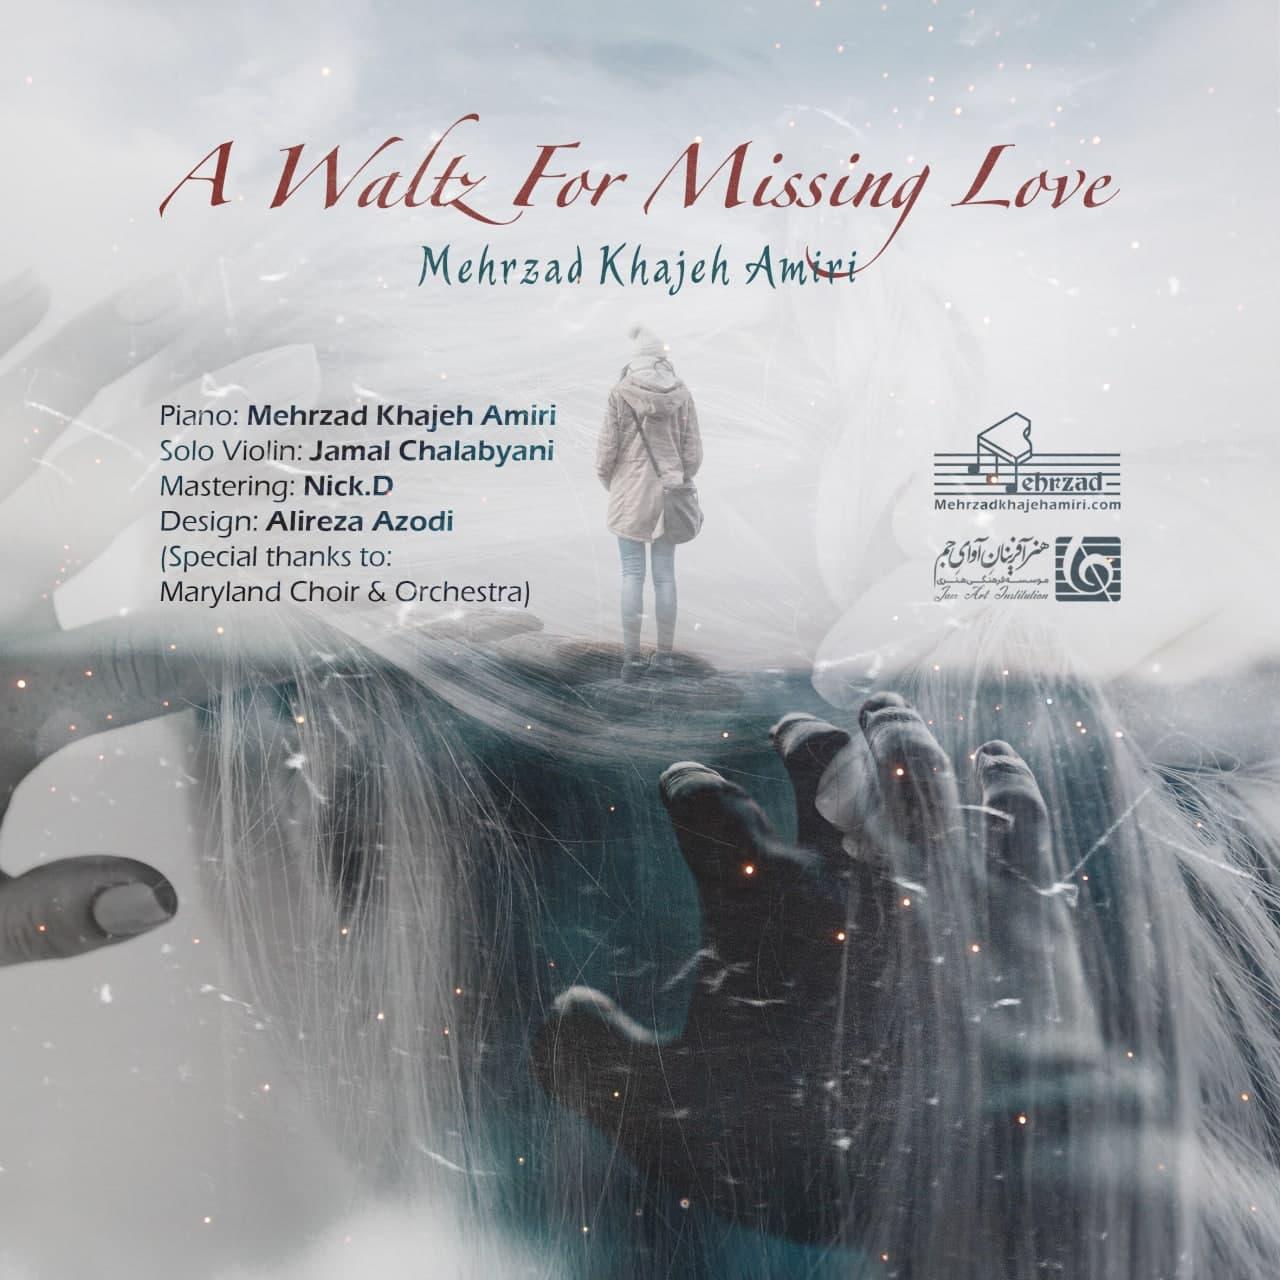 Mehrzad Khajeh Amiri – A Waltz For Missing Love